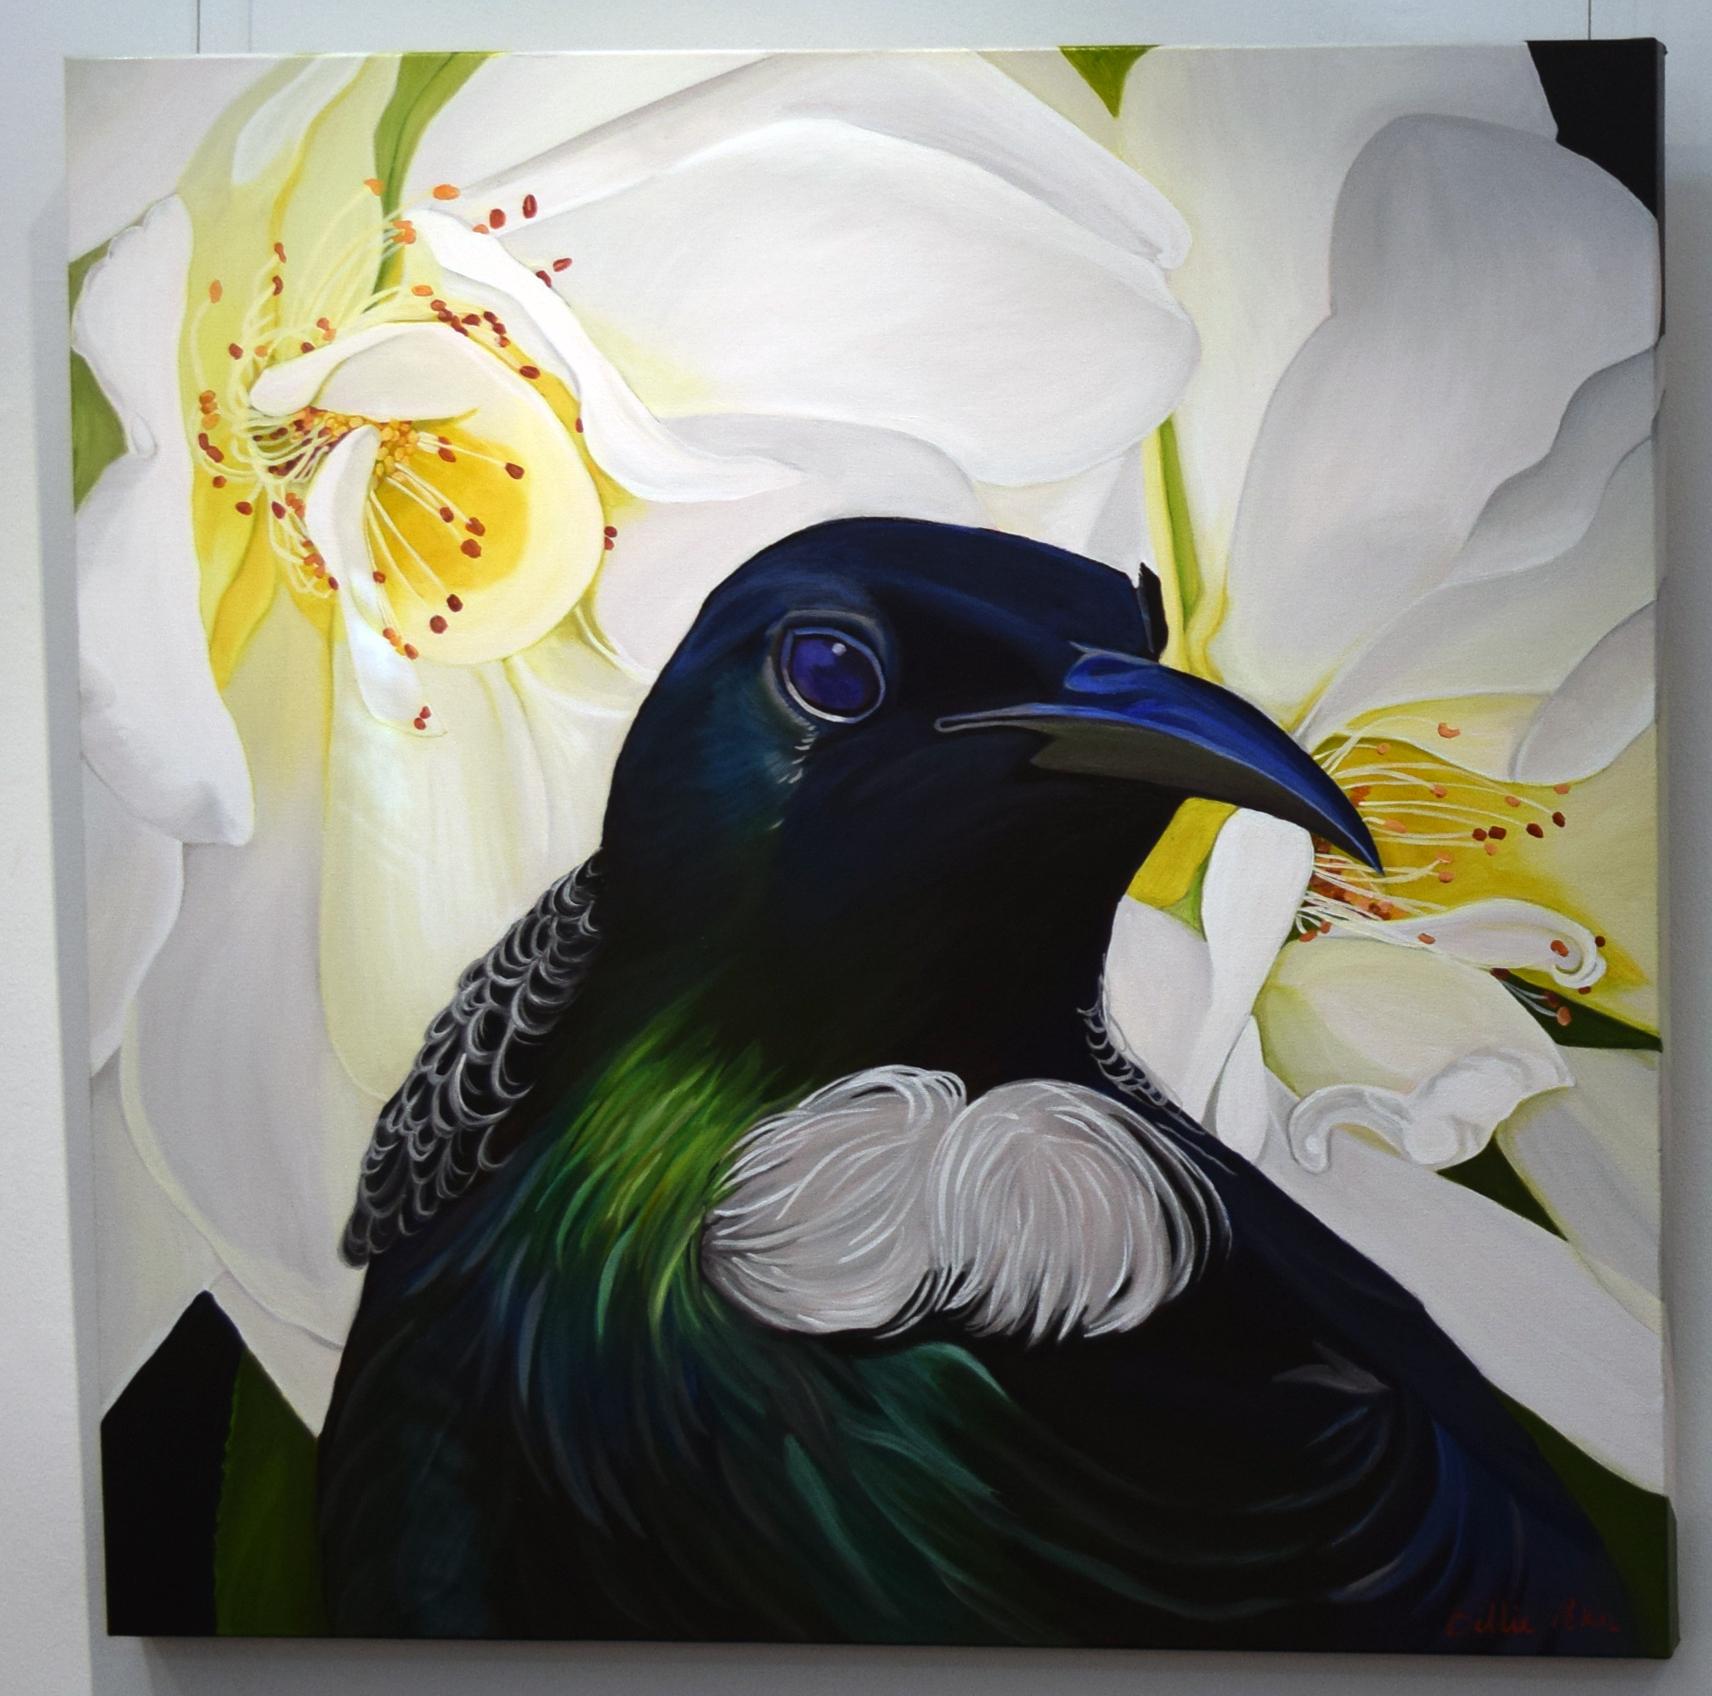 14. Billie Peka, Tui - Messenger, 2018, acrylic on canvas, 76 x 76 cm, $555